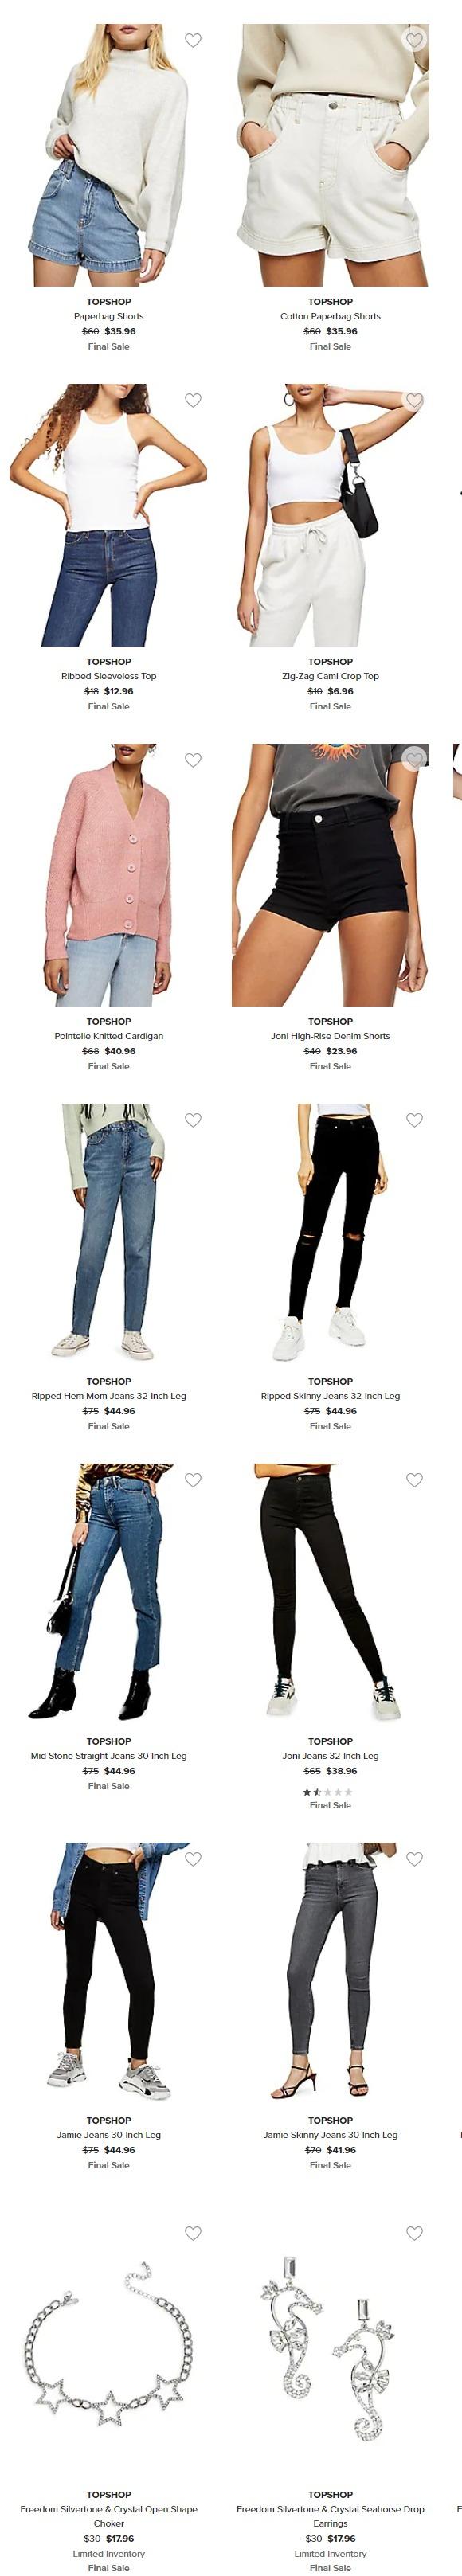 TOPSHOP 潮款服饰 4折起:百搭款牛仔裤38.96加元、牛仔短裤23.96加元、背心 6.96加元